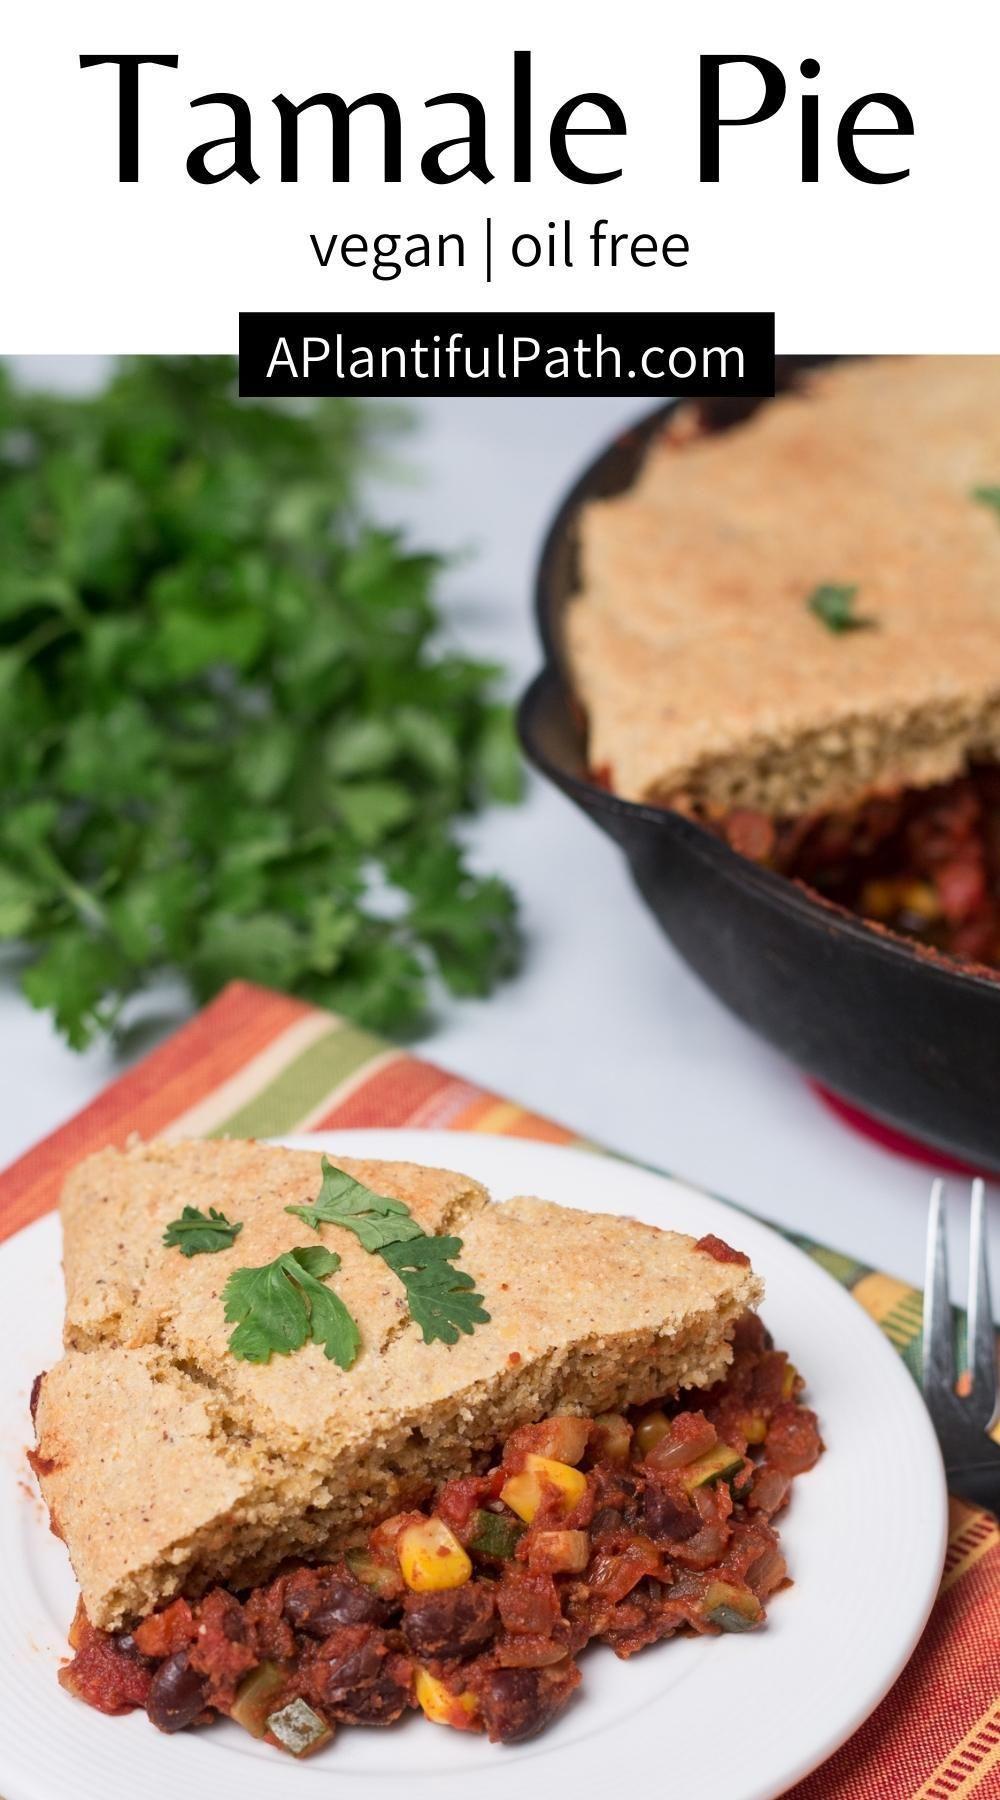 Vegan Tamale Pie Easy Oil Free A Plantiful Path Recipe In 2020 Oil Free Vegan Recipes Vegan Tamales Vegan Dinner Recipes